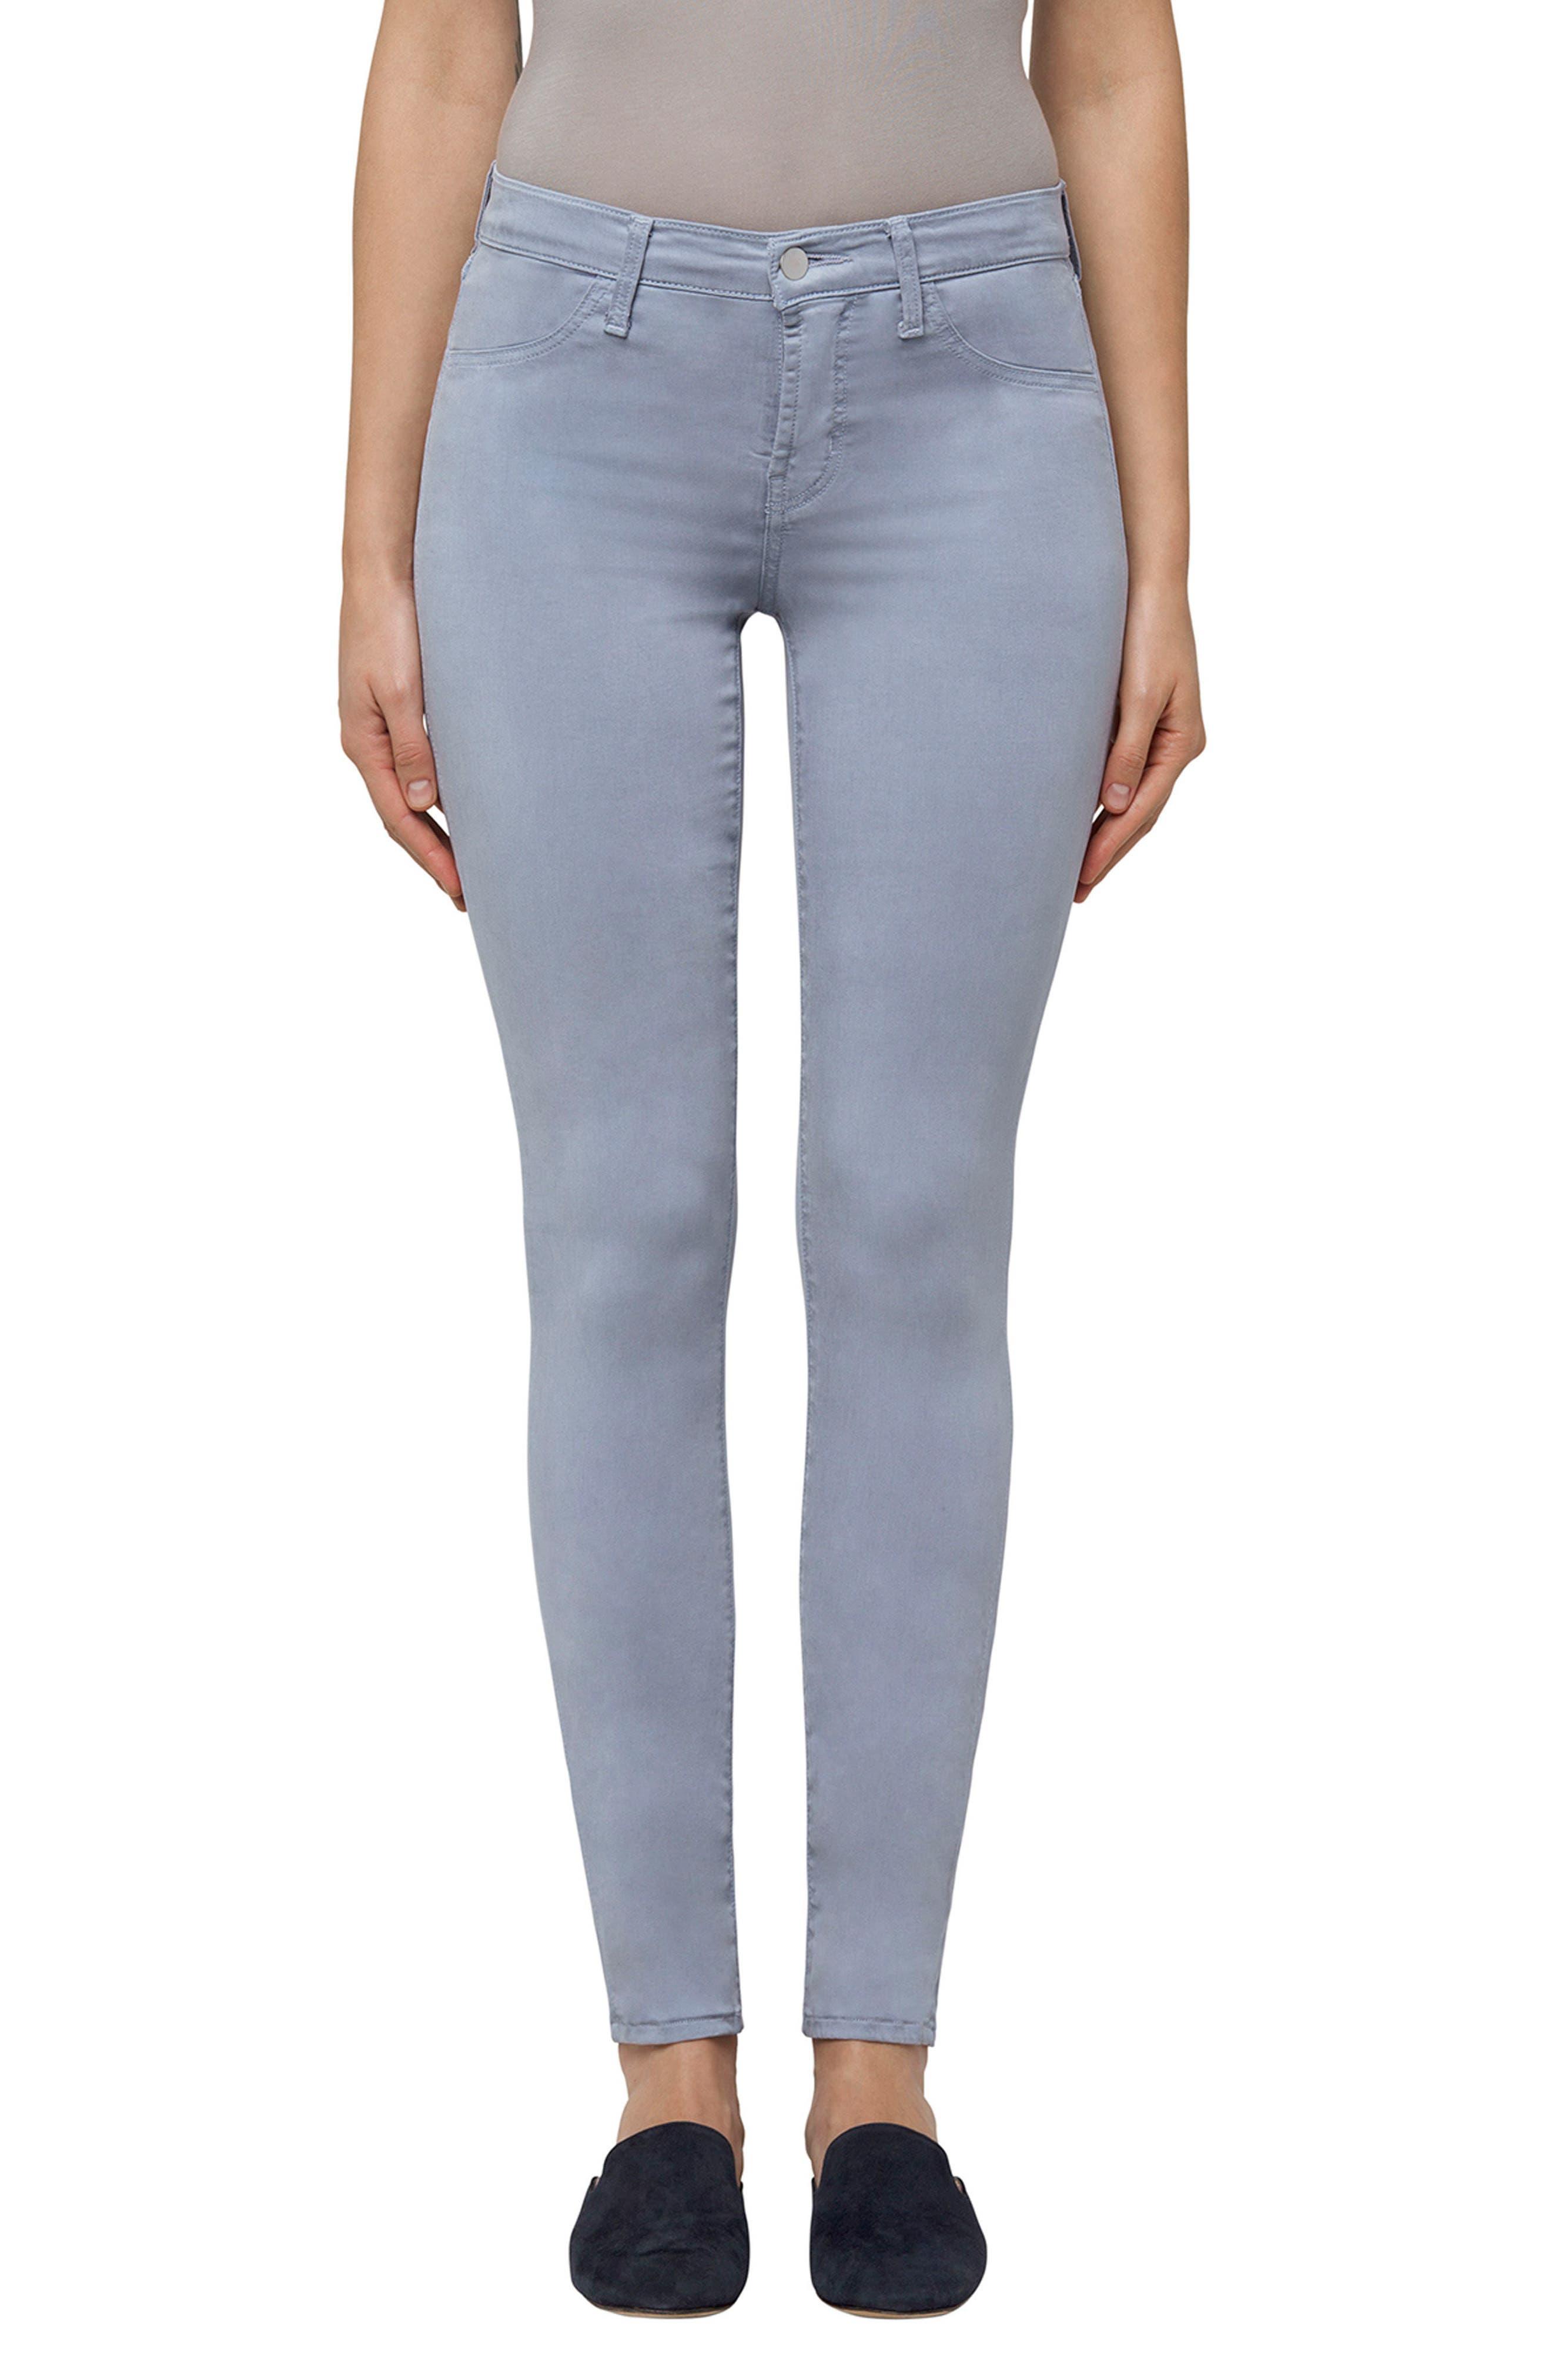 Alternate Image 1 Selected - J Brand High Waist Ankle Super Skinny Jeans